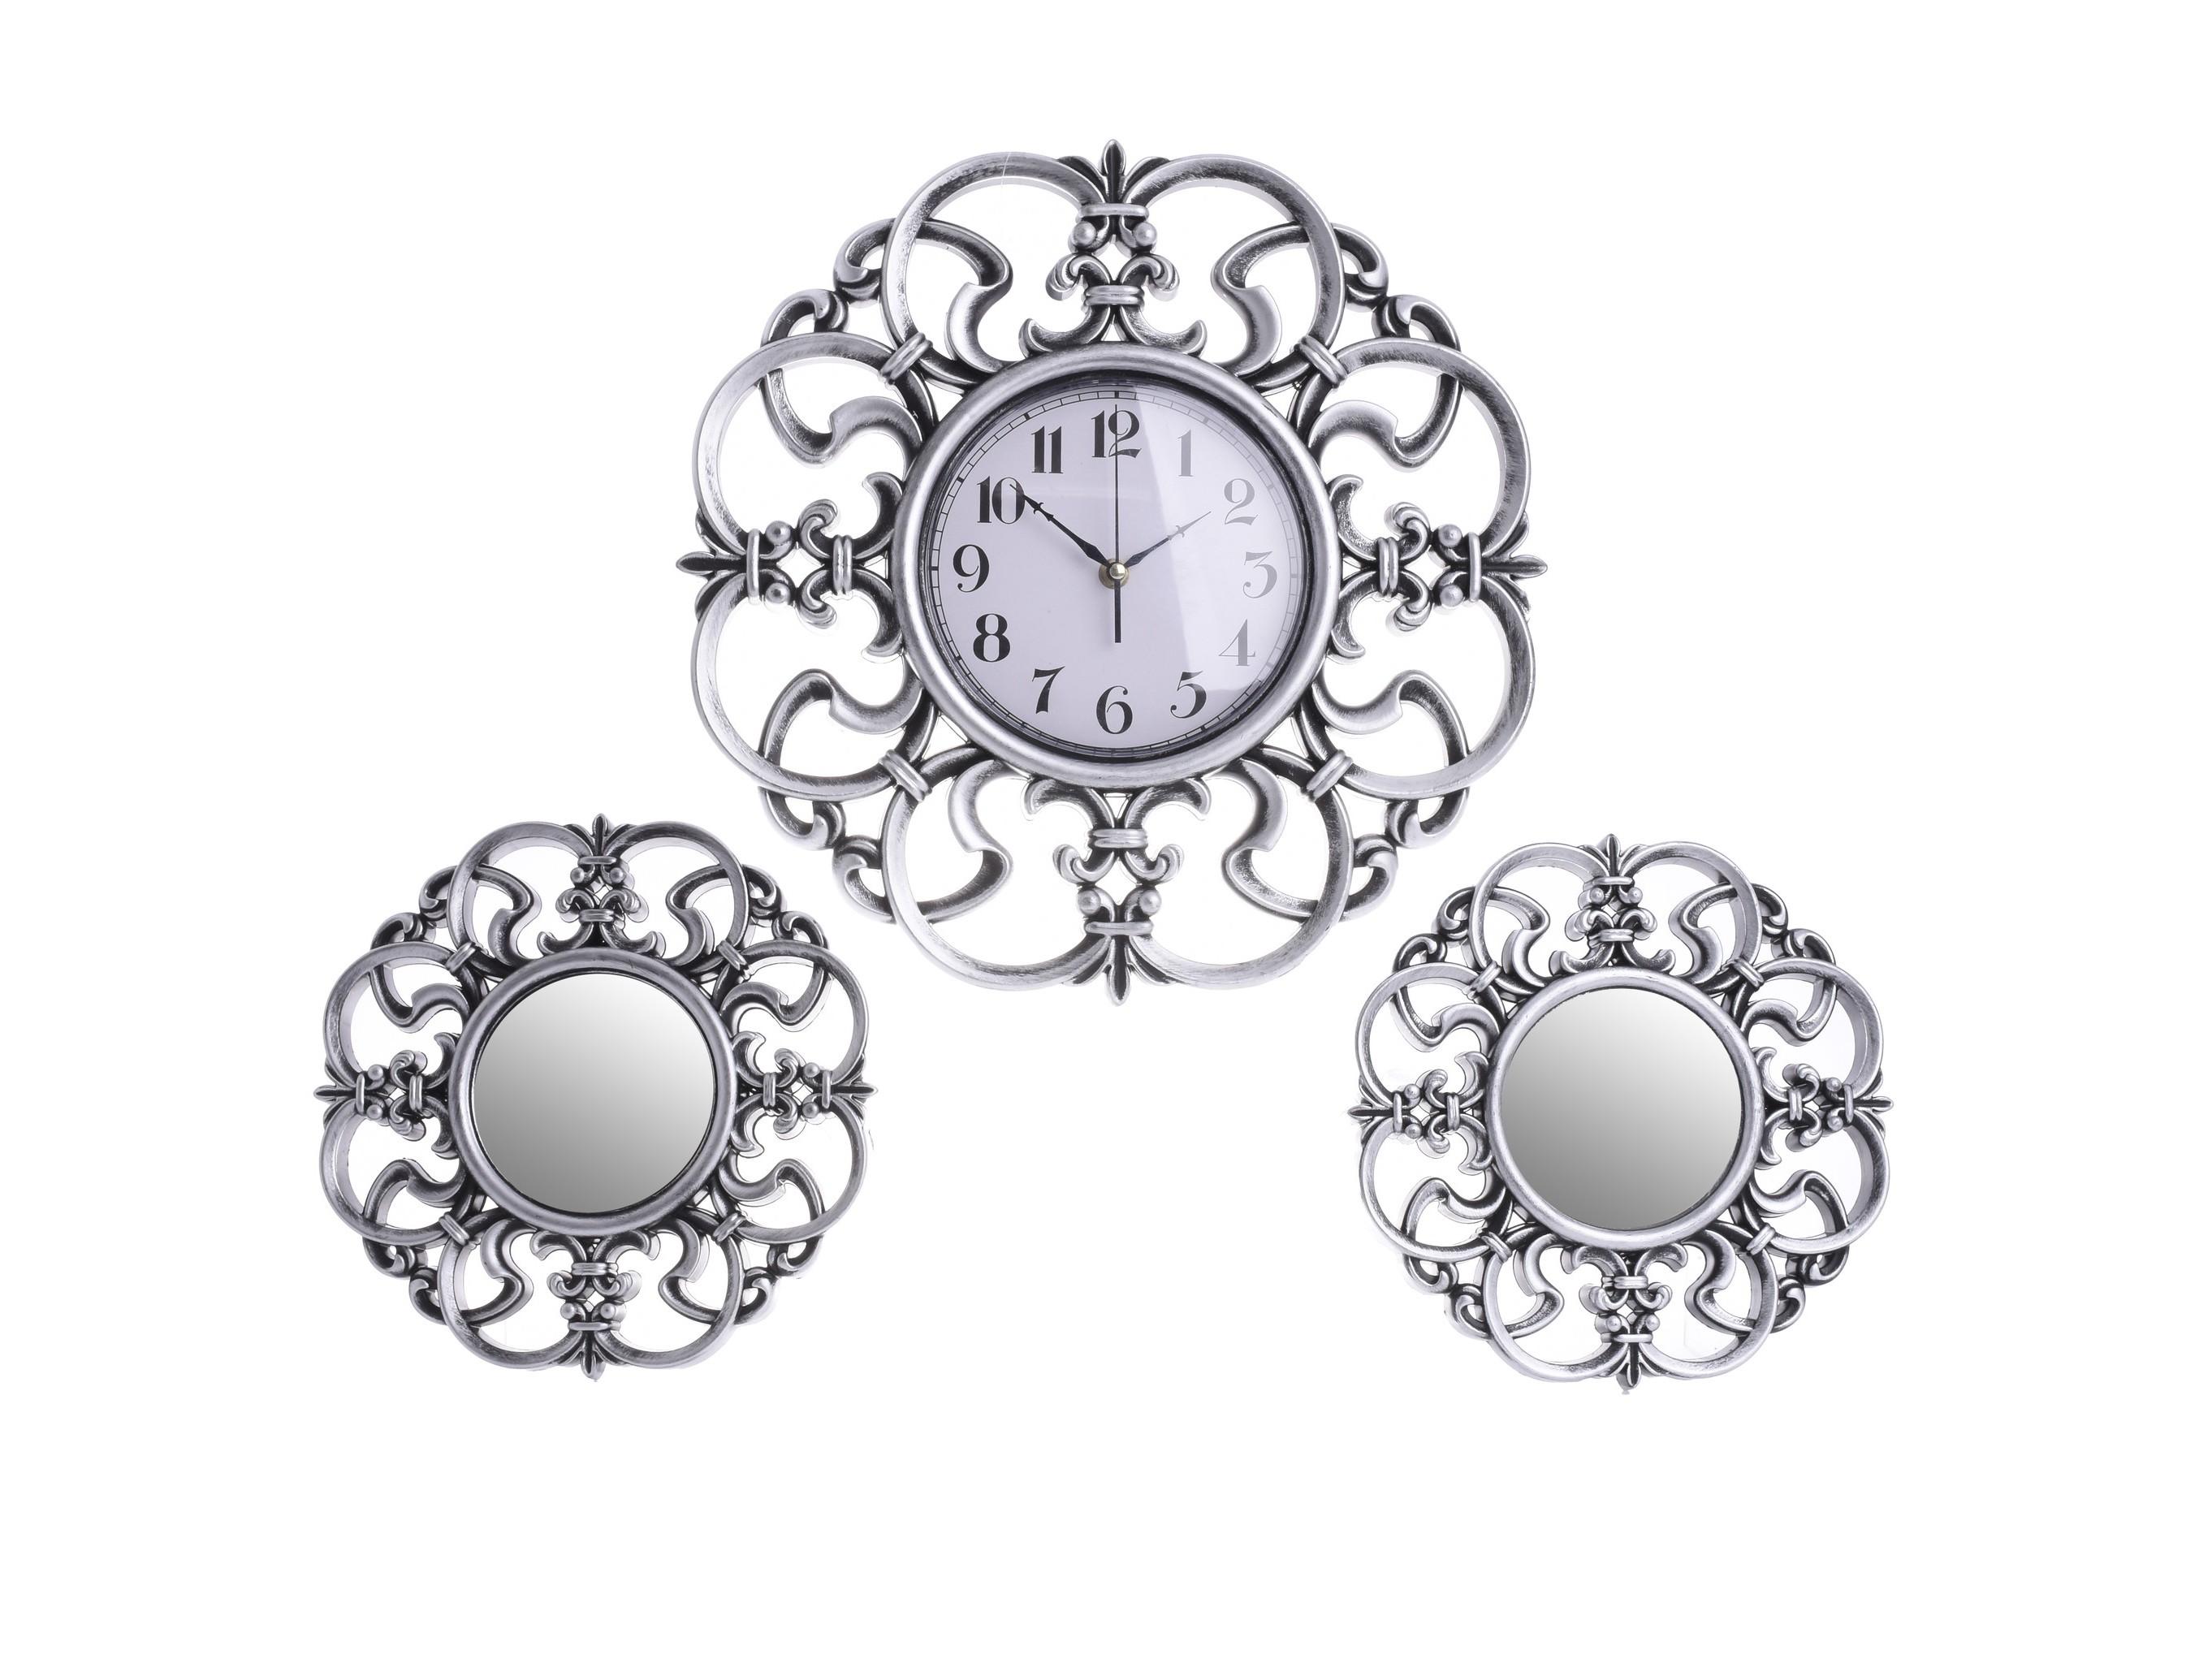 Часы настенные с двумя зеркалами A?manНастенные часы<br>Часы настенные с двумя зеркалами&amp;lt;div&amp;gt;Кварцевый механизм&amp;lt;/div&amp;gt;<br><br>Material: Пластик<br>Ширина см: 40.0<br>Высота см: 40.0<br>Глубина см: 2.0